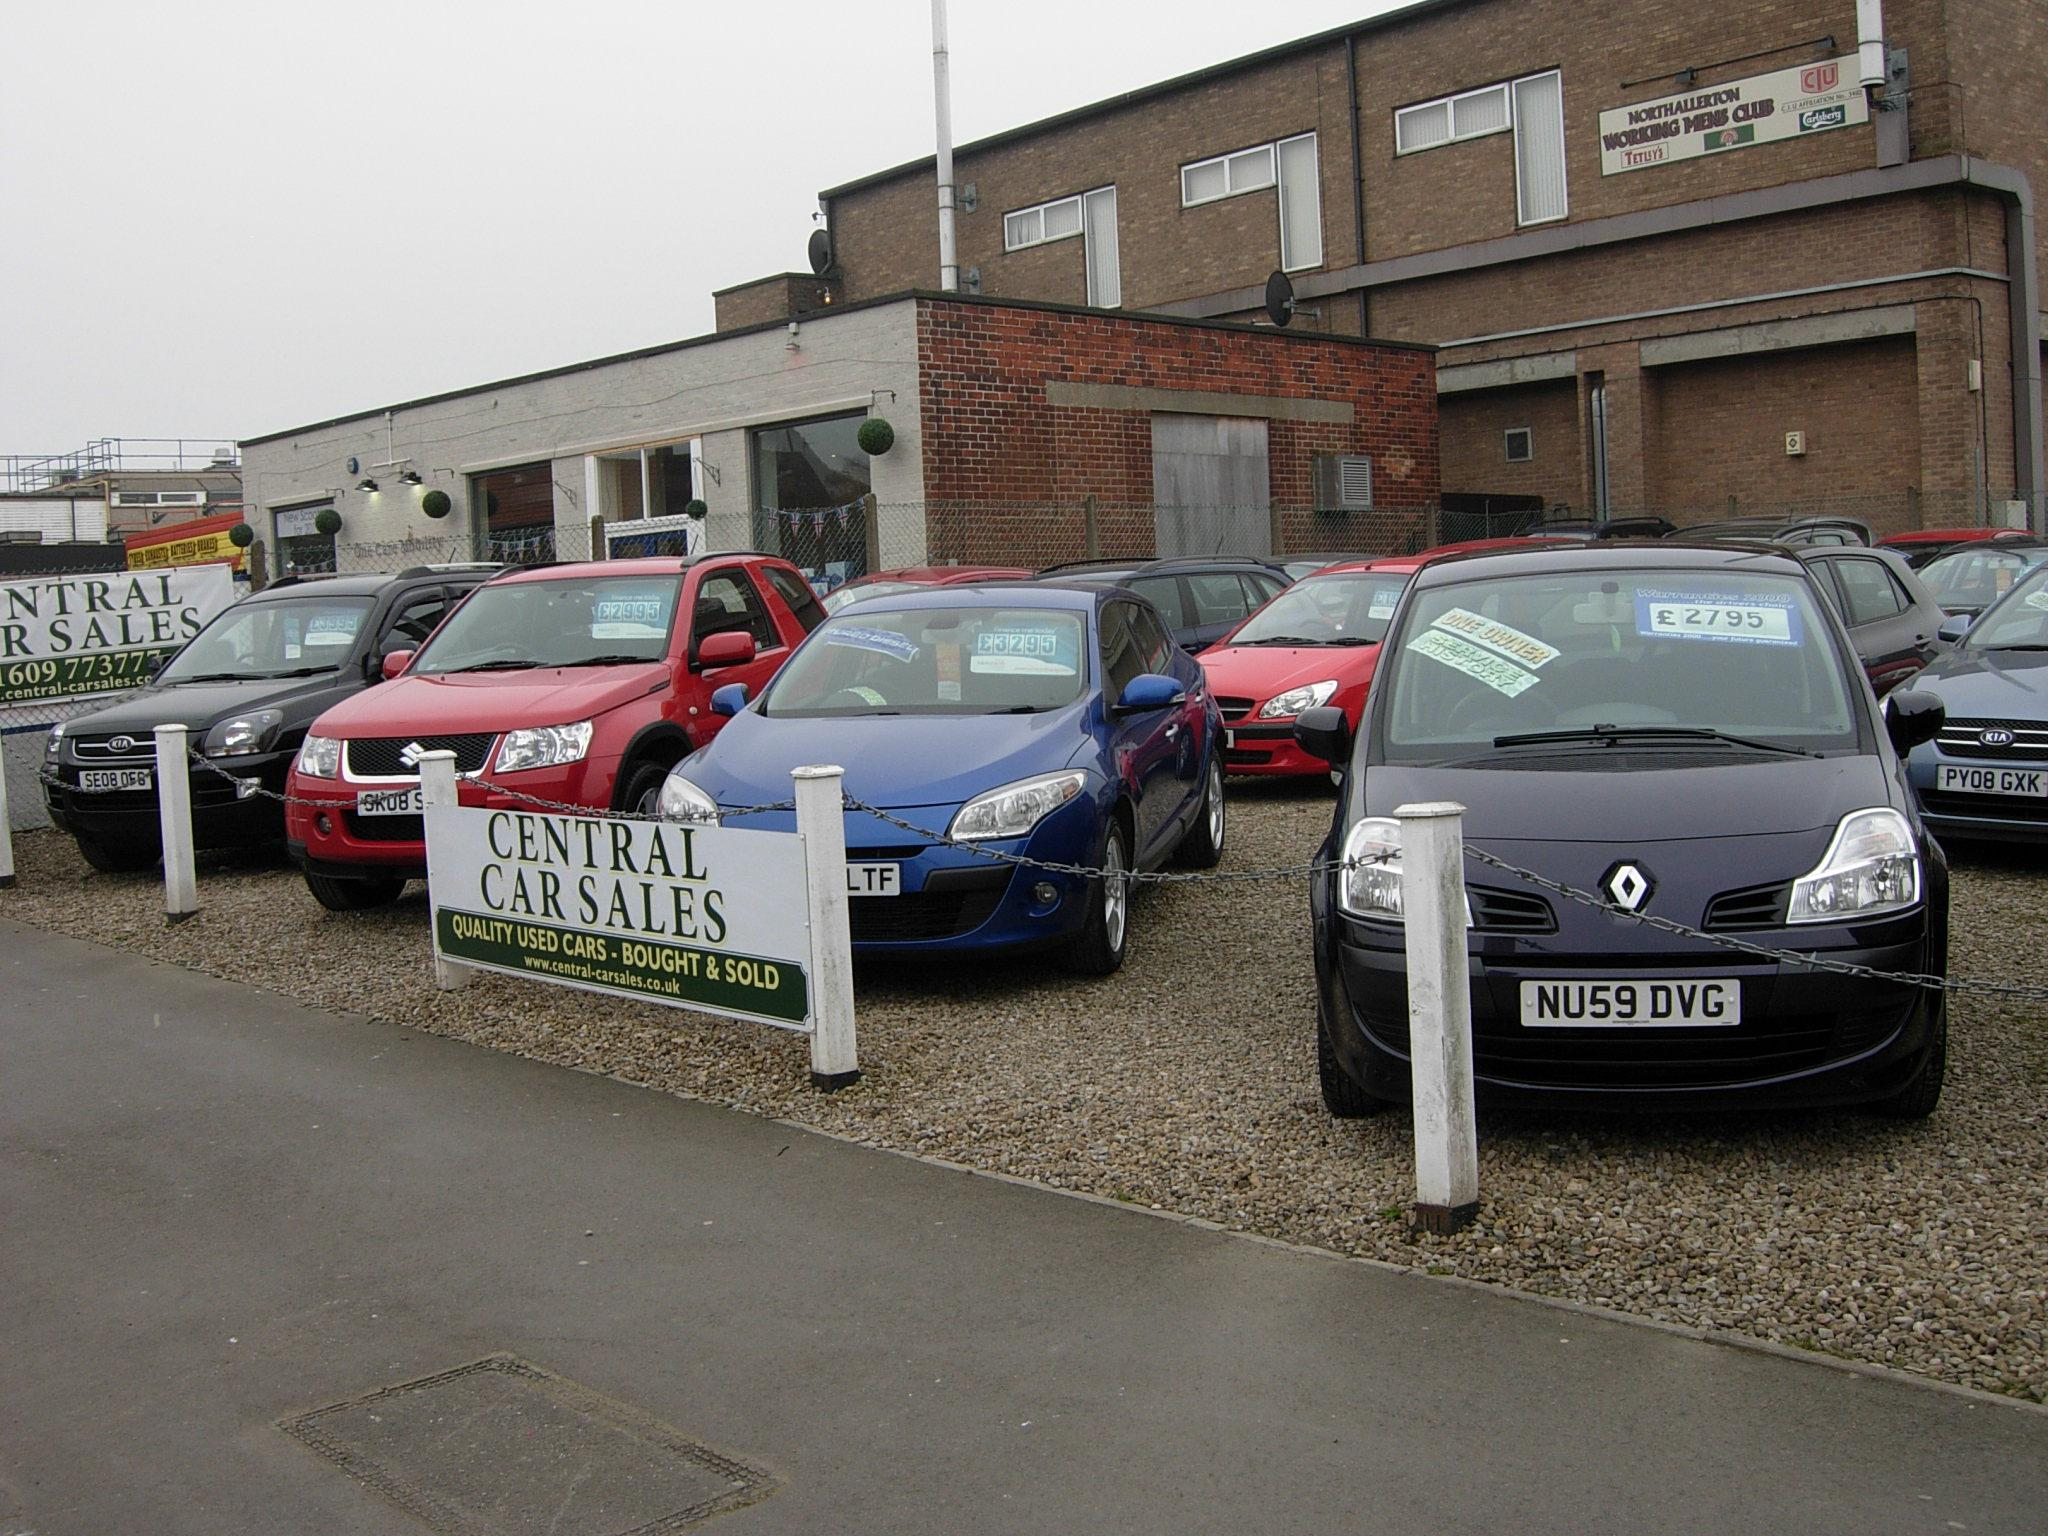 Central Car Sales Stockton On Tees